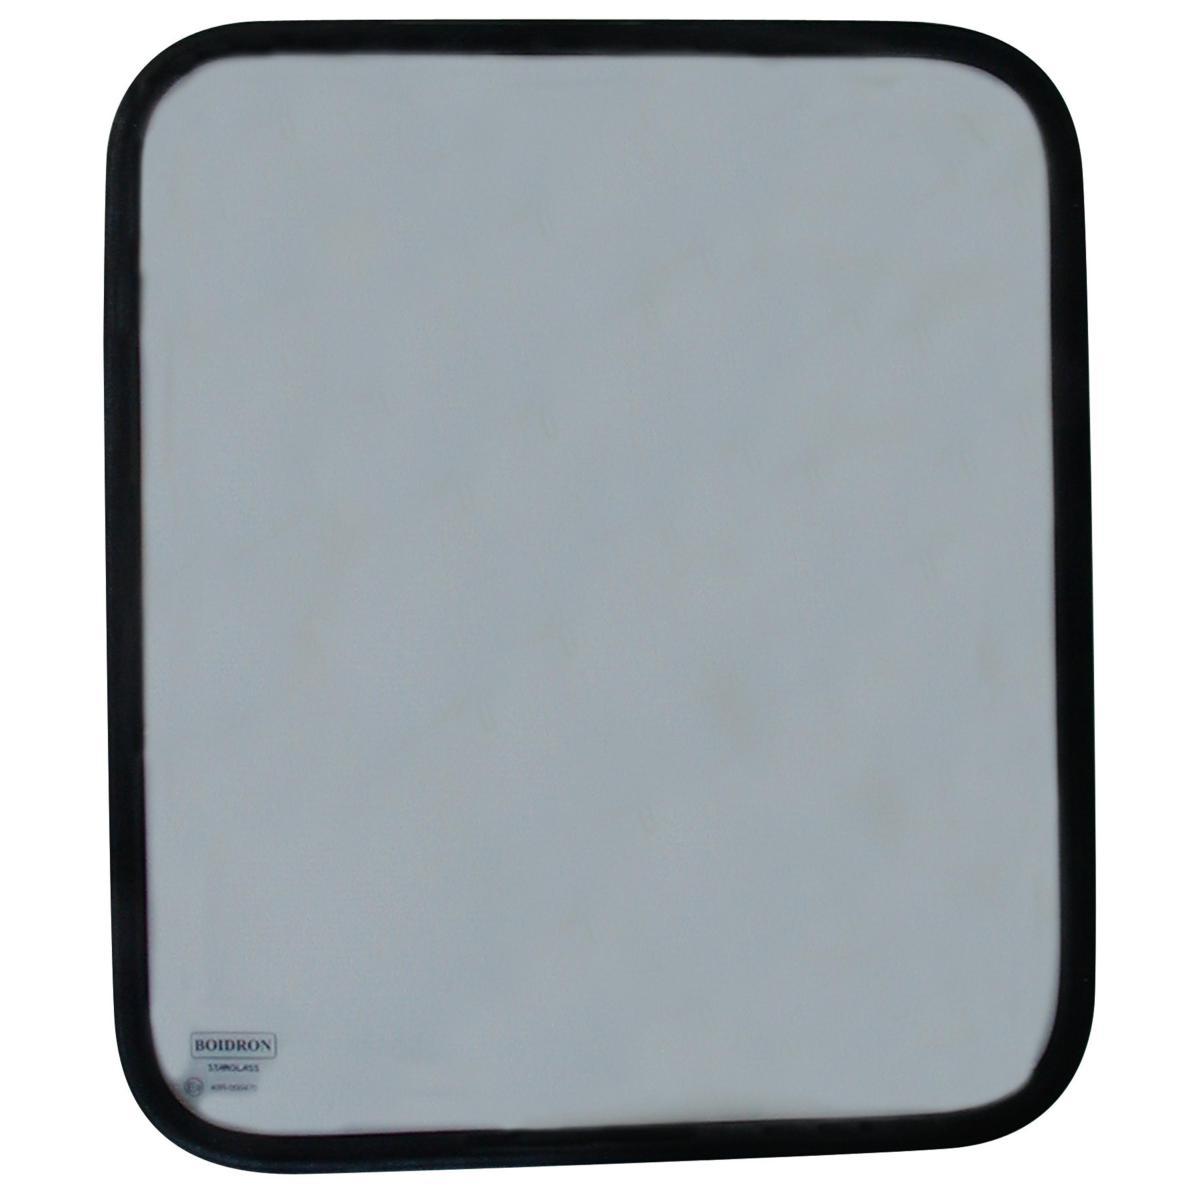 Fenêtre En Verre 600 X 400 Mm Cadre Aluminium Noir